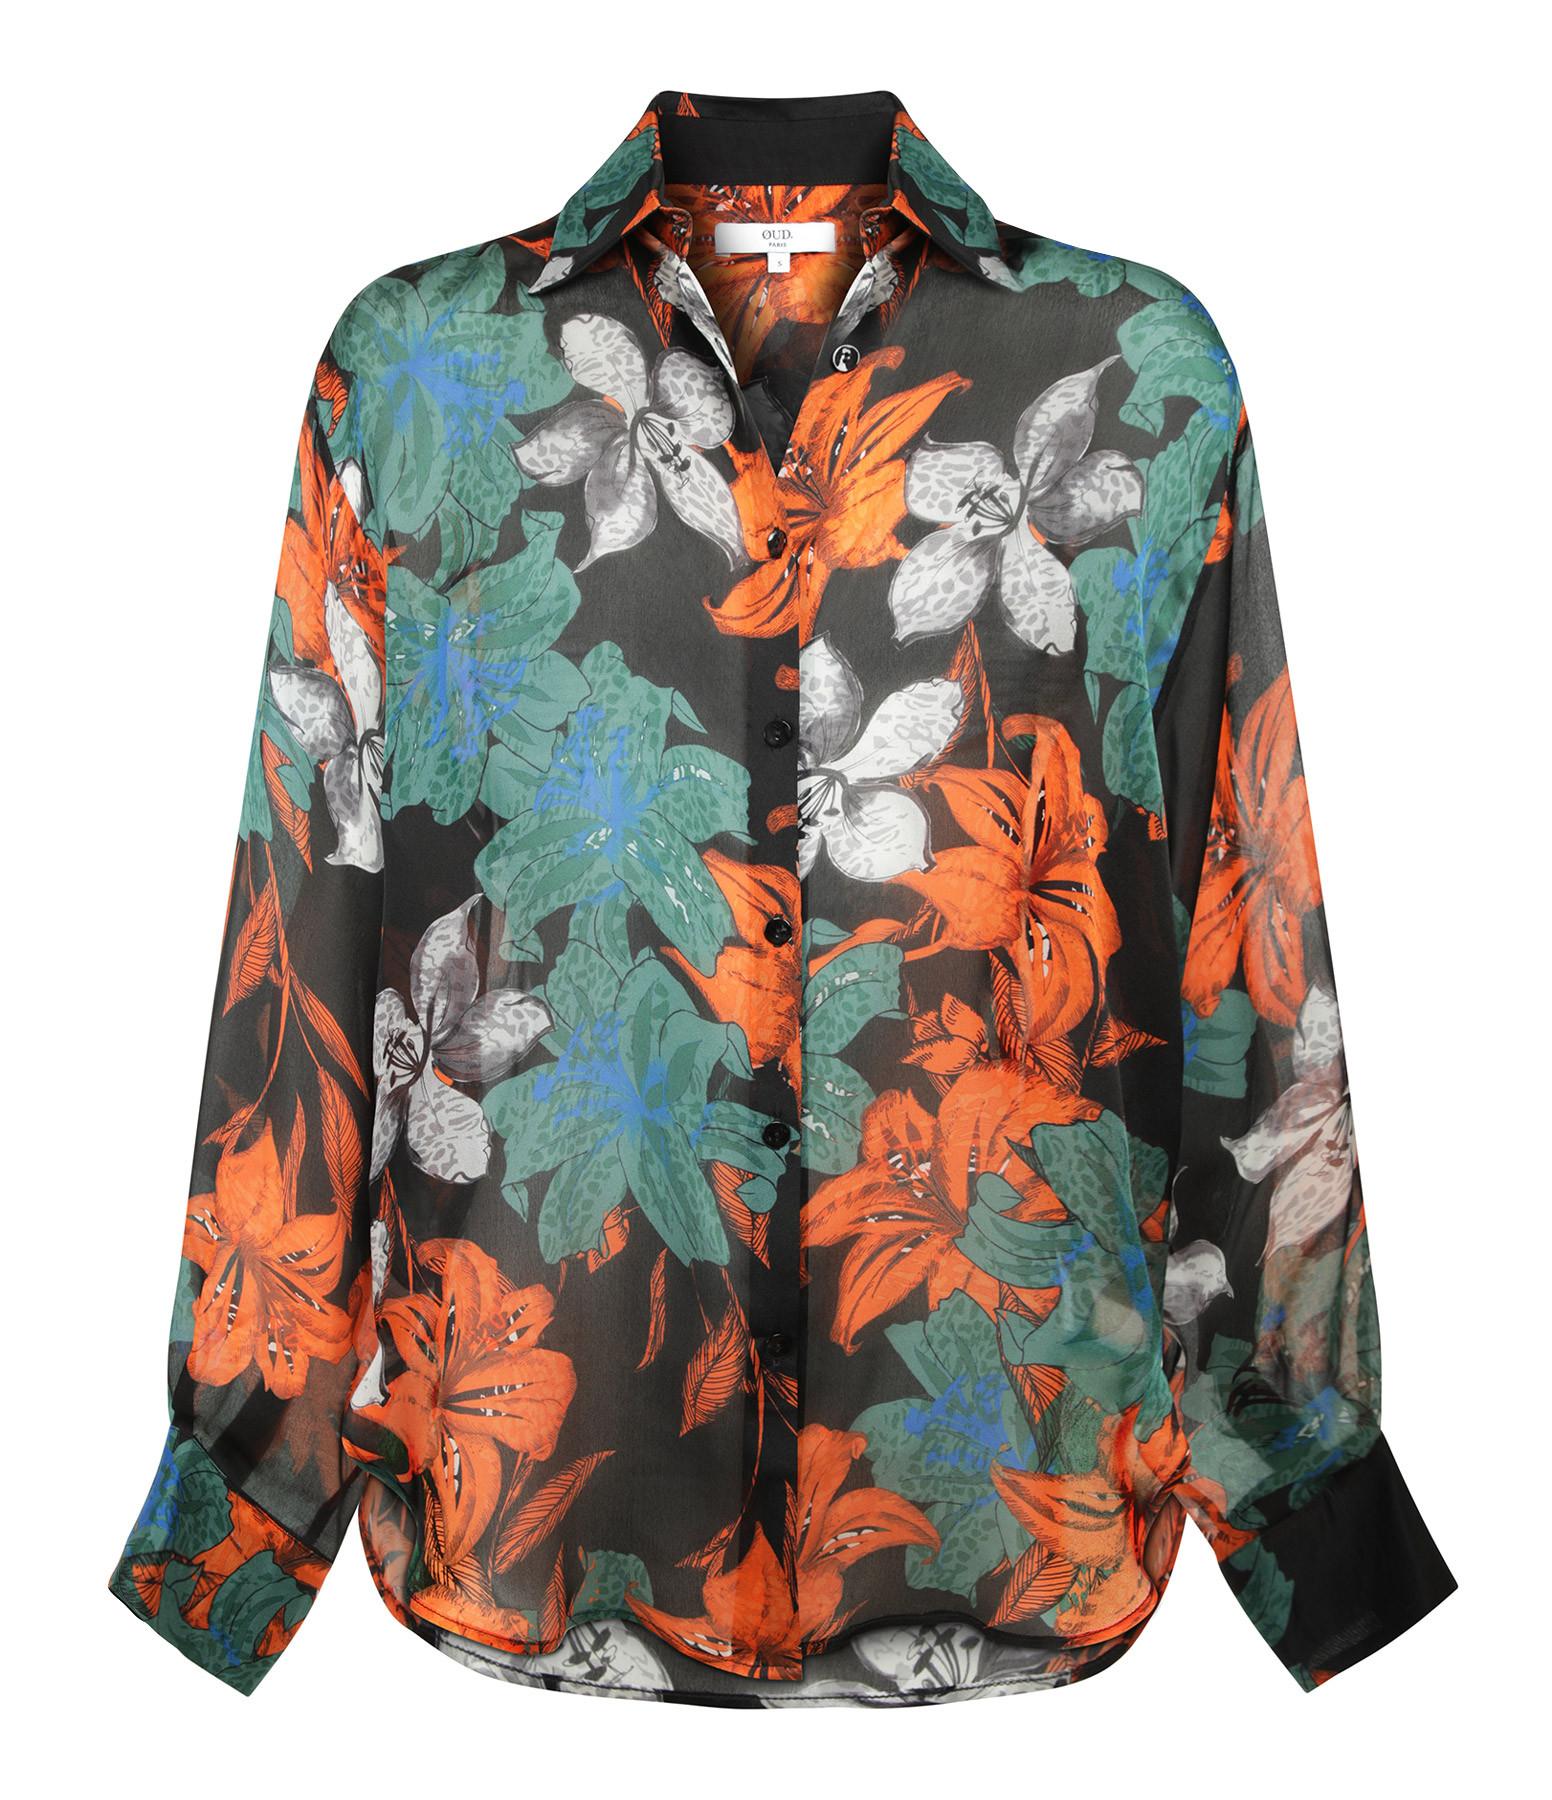 OUD - Top Elda Soie Imprimé Floral